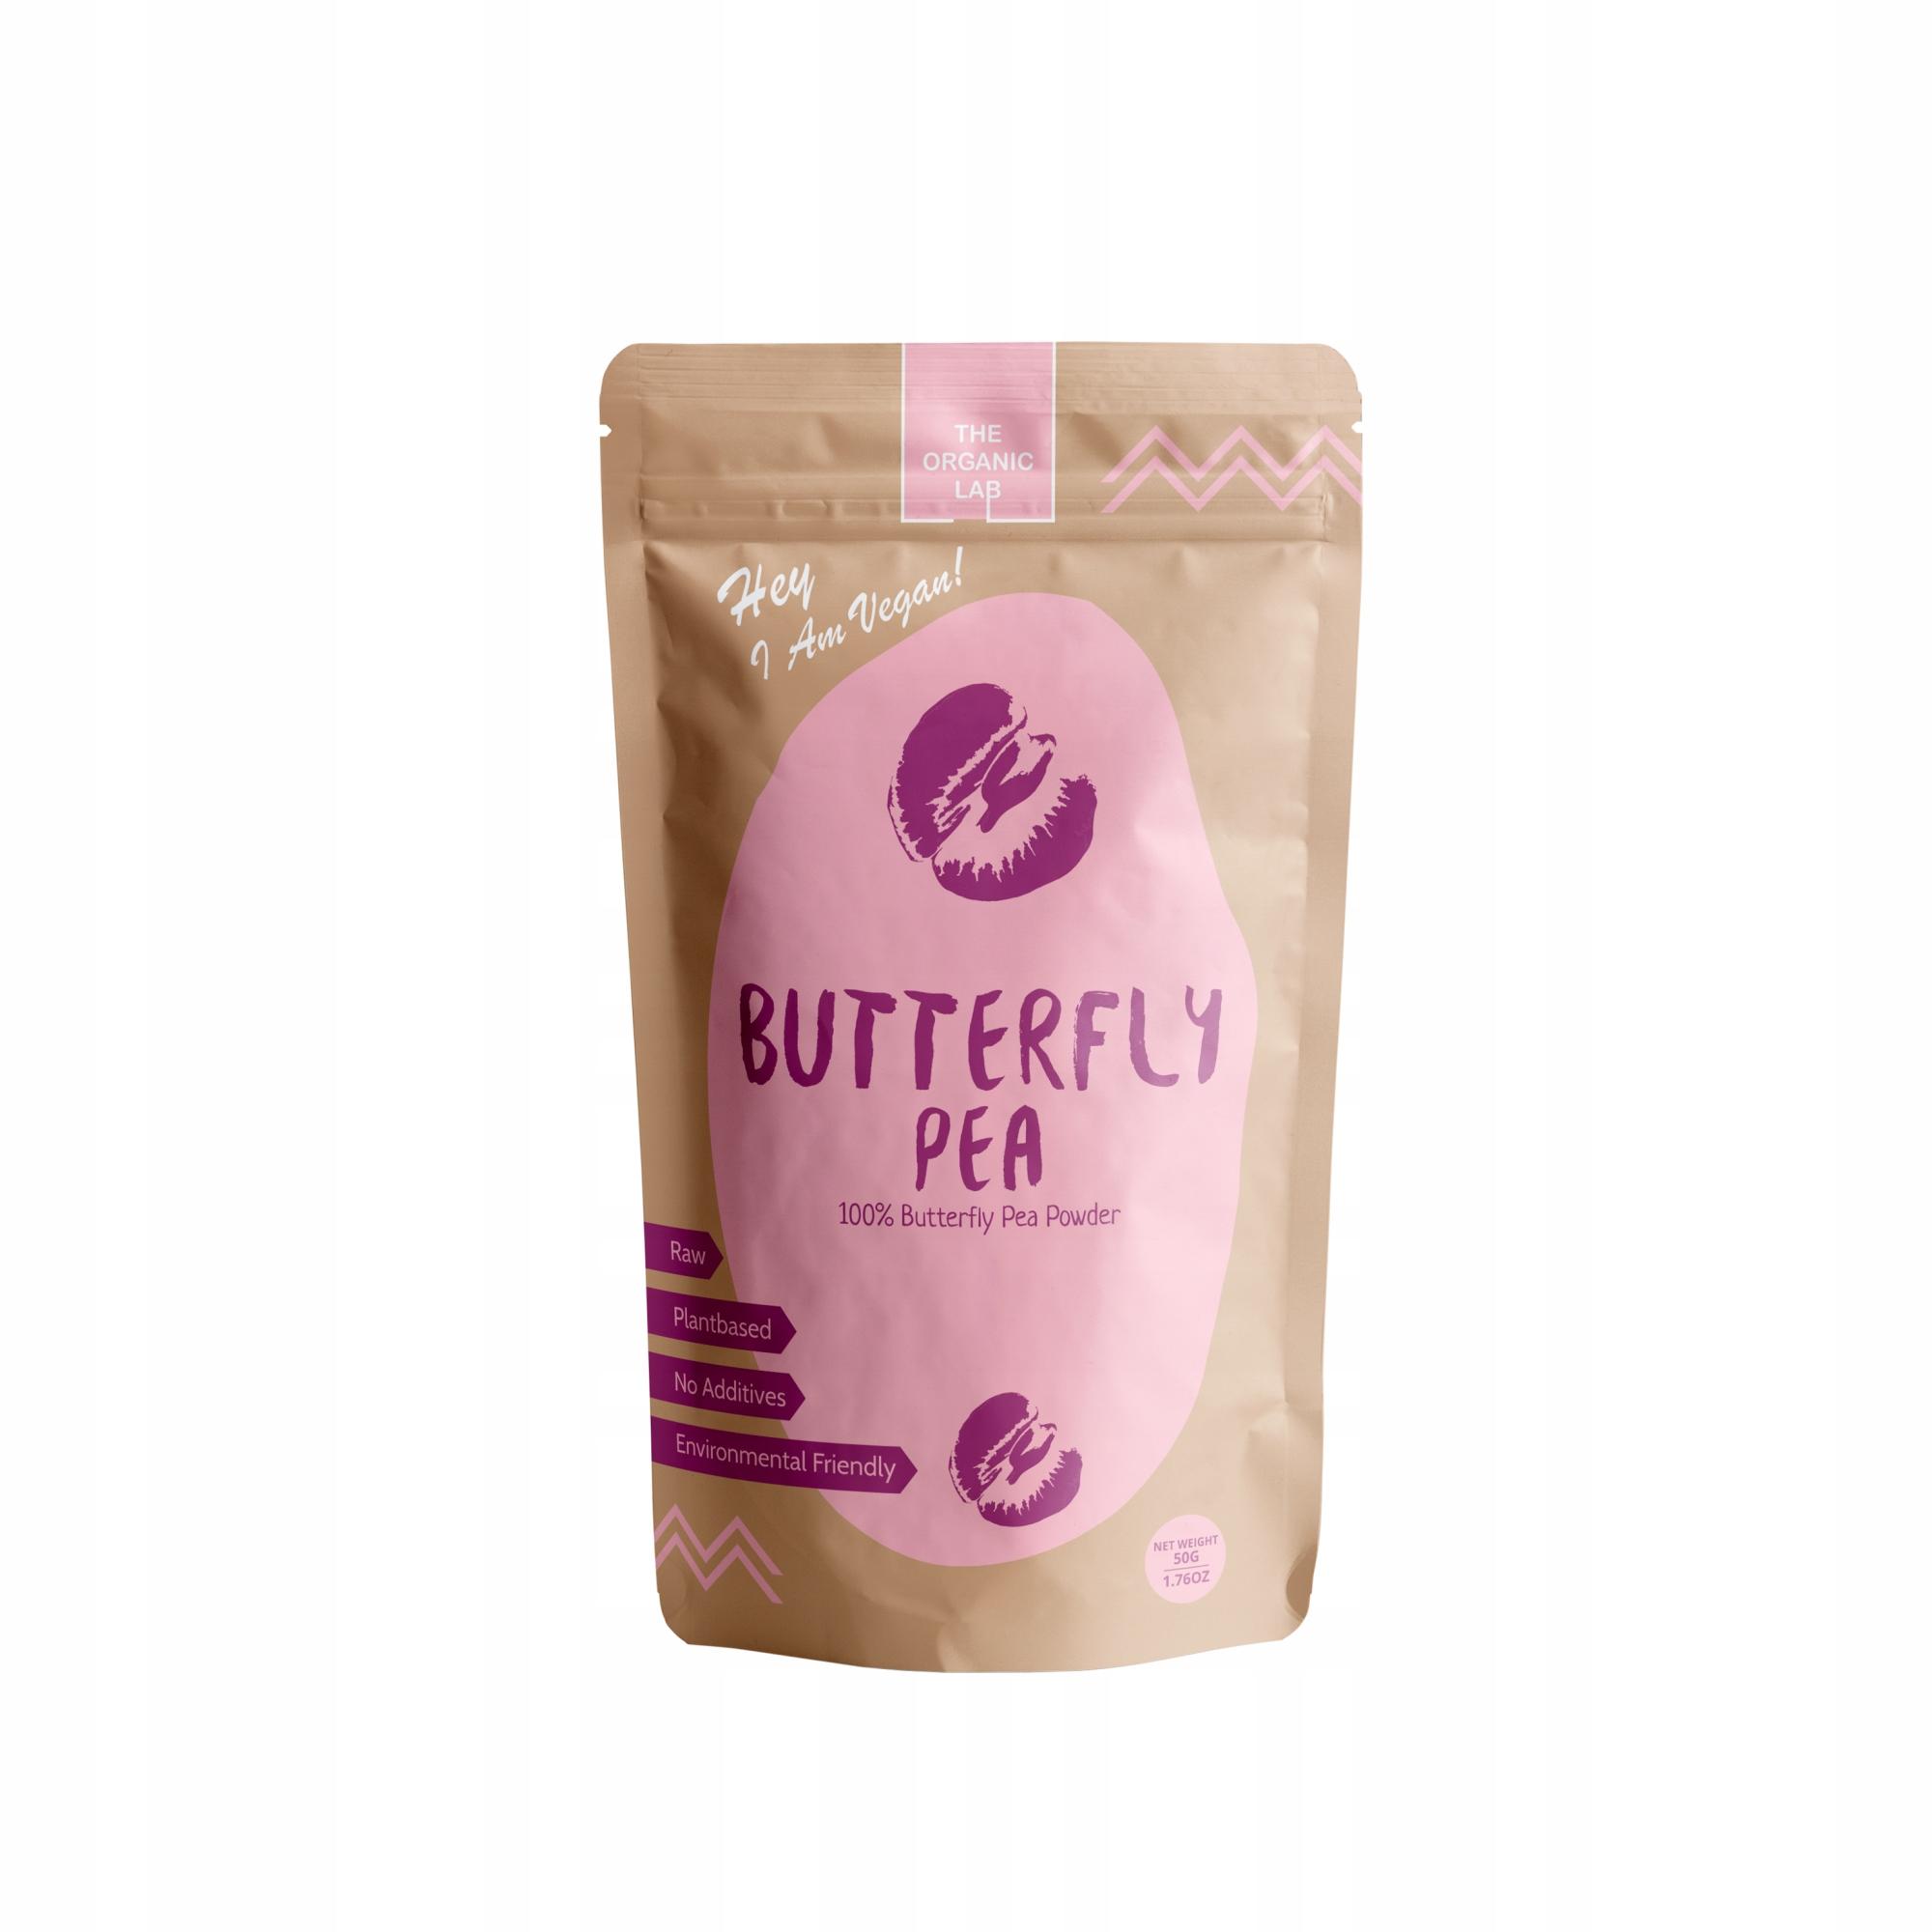 Motýľ pea (Motýľ pea) - 50g